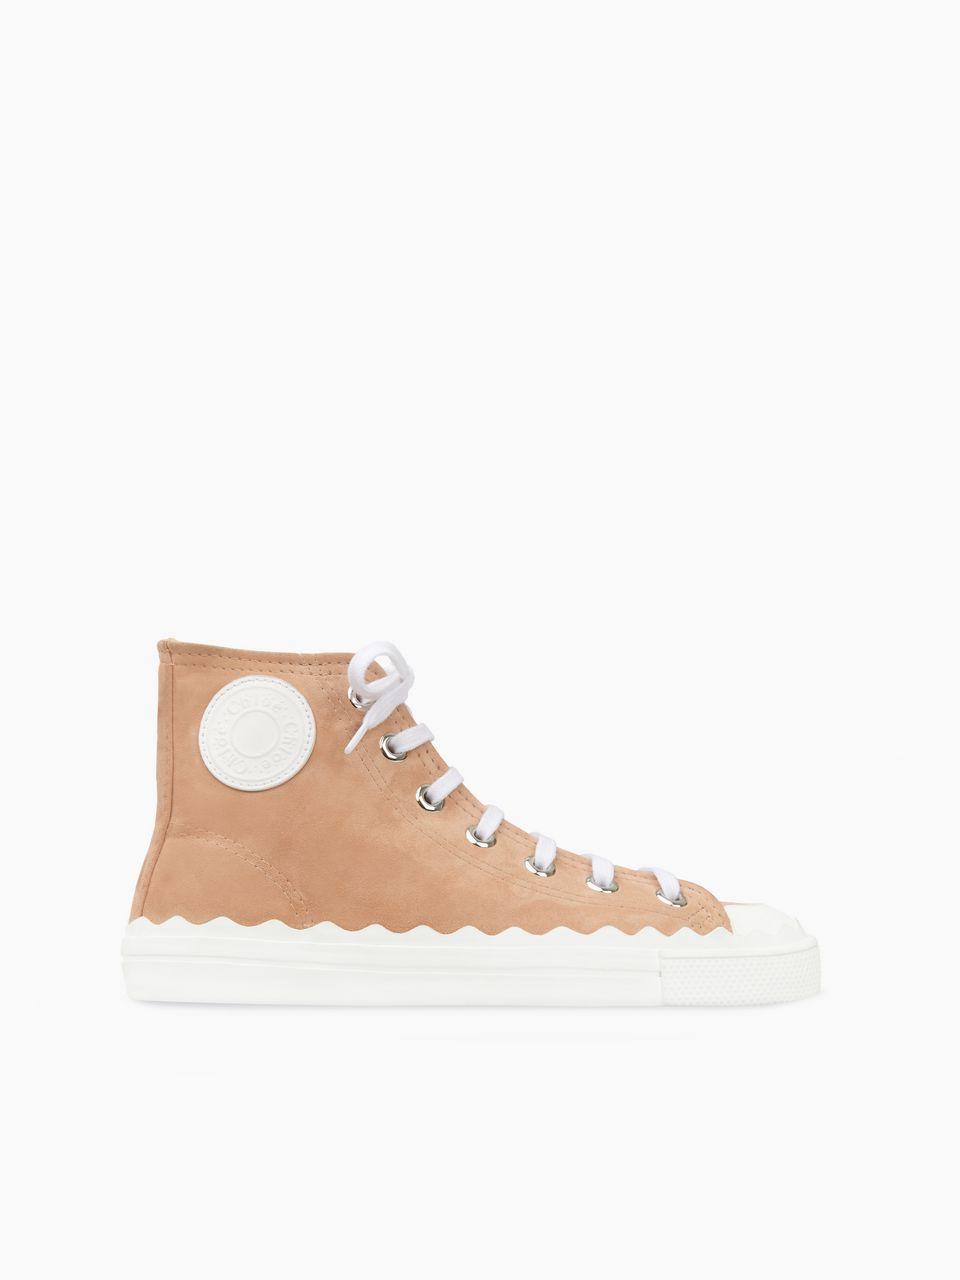 Chloe Kyle Sneaker   Tan